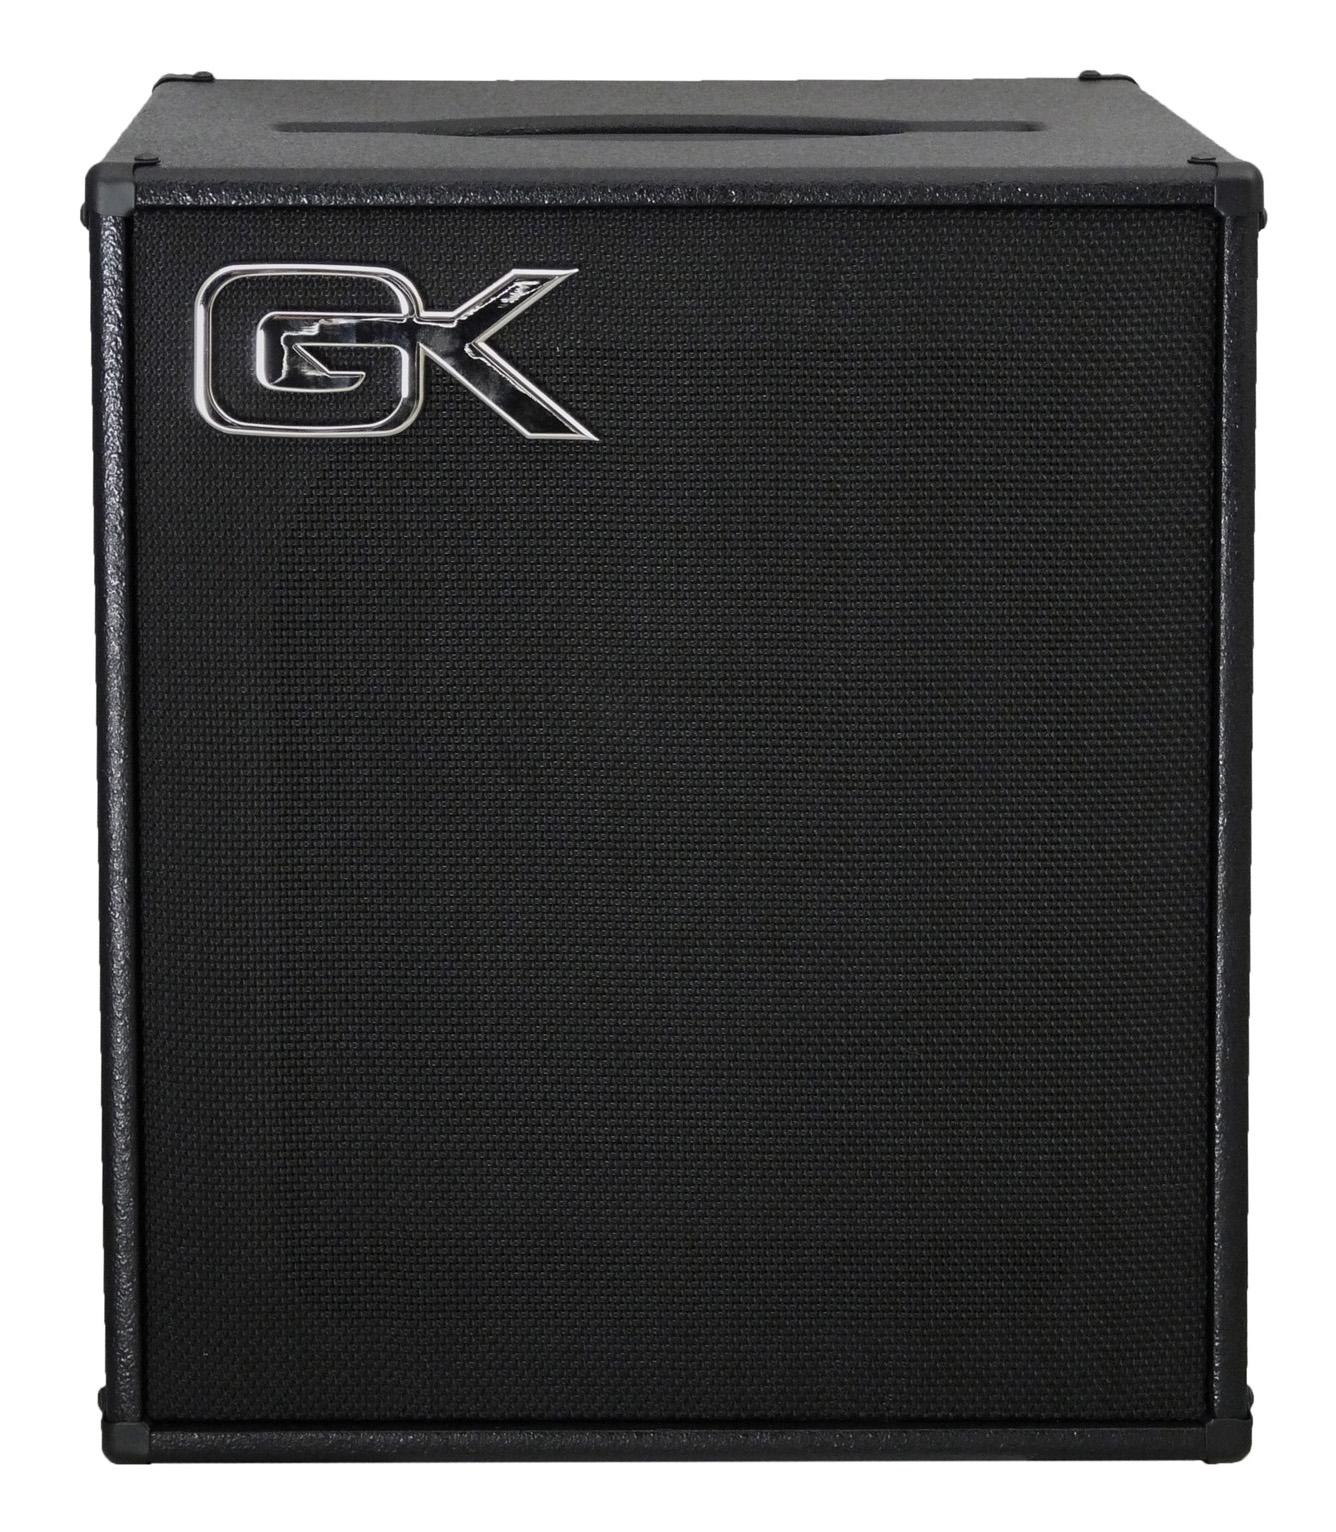 Buy gk MBP 200 Watt Ceramic 1X12 Powered Speaker Cabinet Melody House